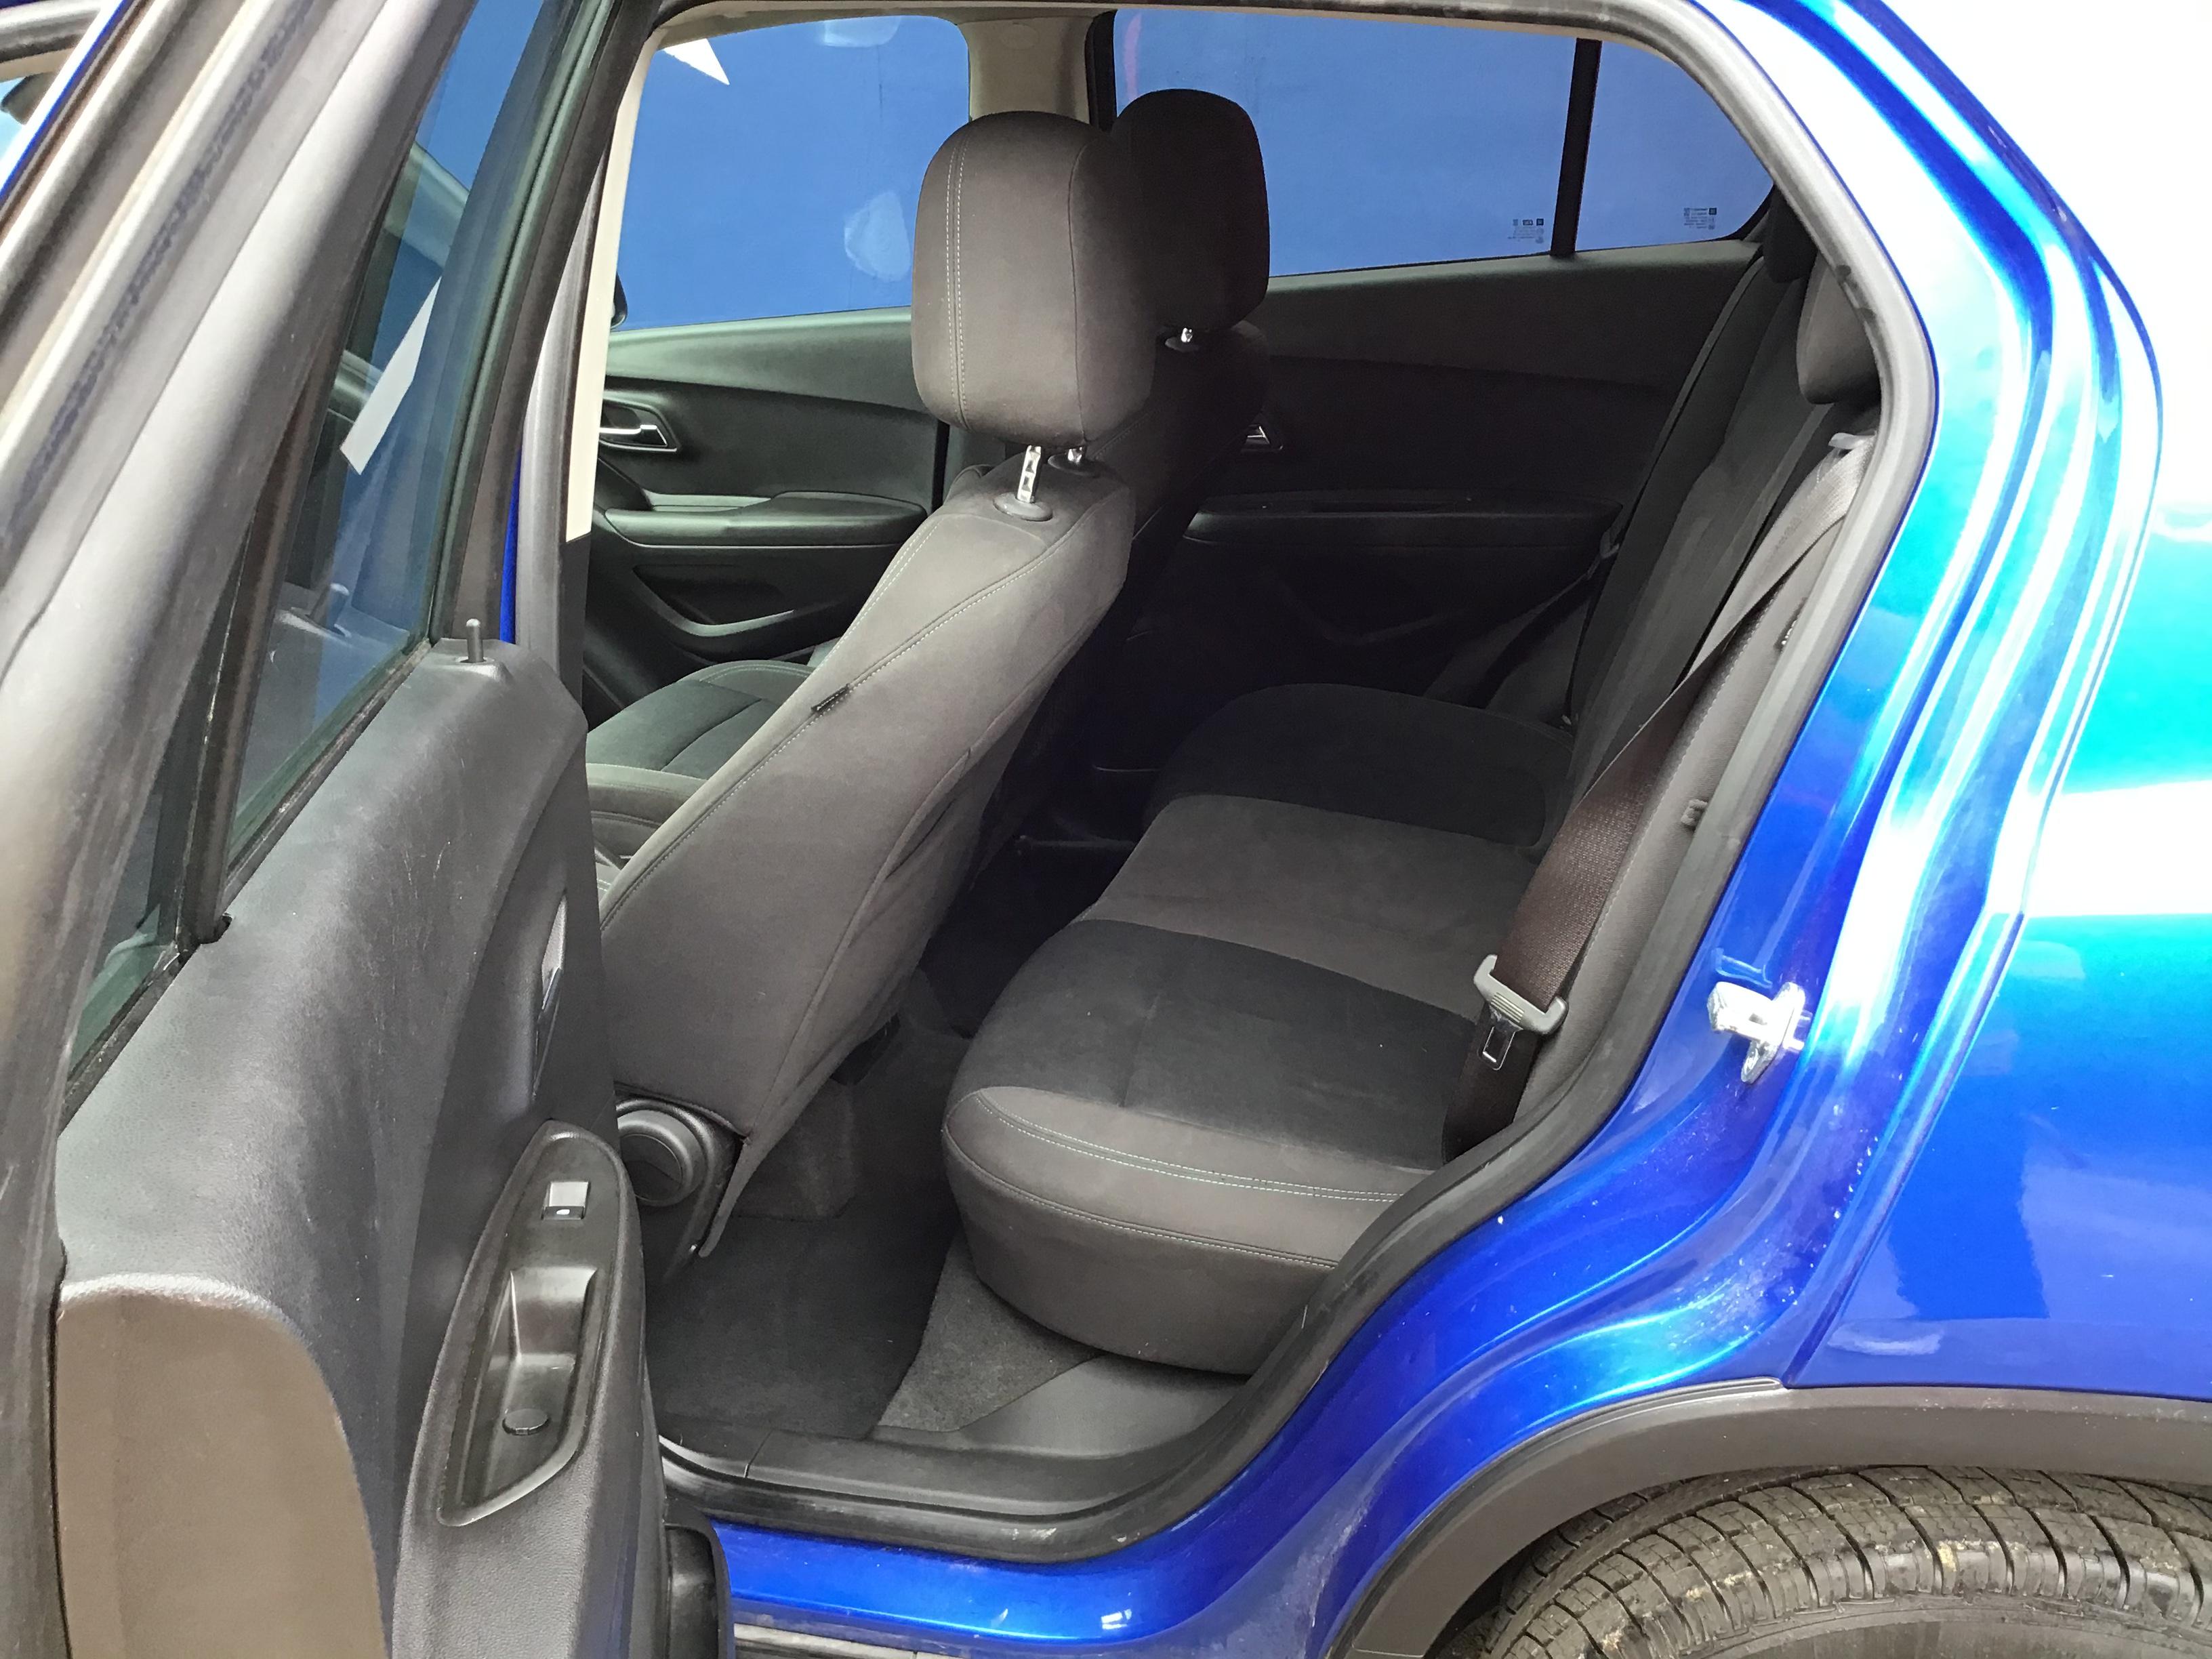 used vehicle - SUV CHEVROLET TRAX 2015